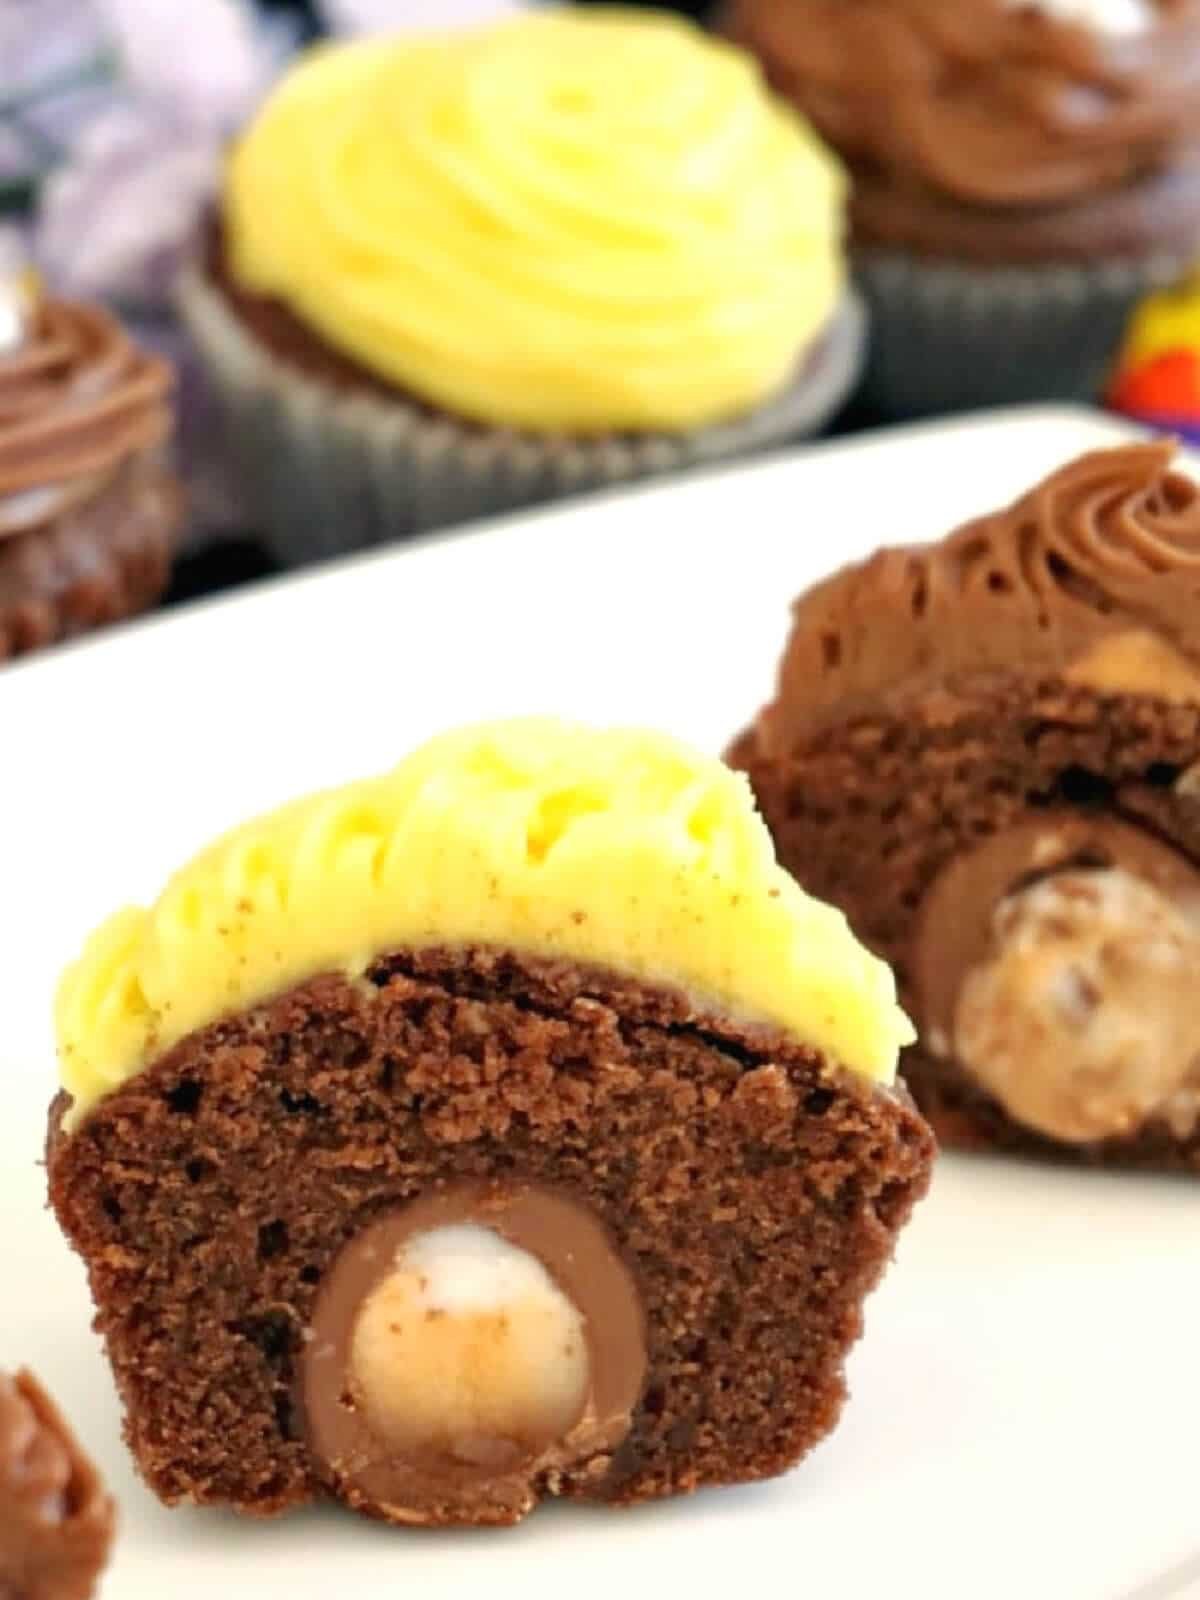 Half of a cupcake to show the hiddren creme egg inside